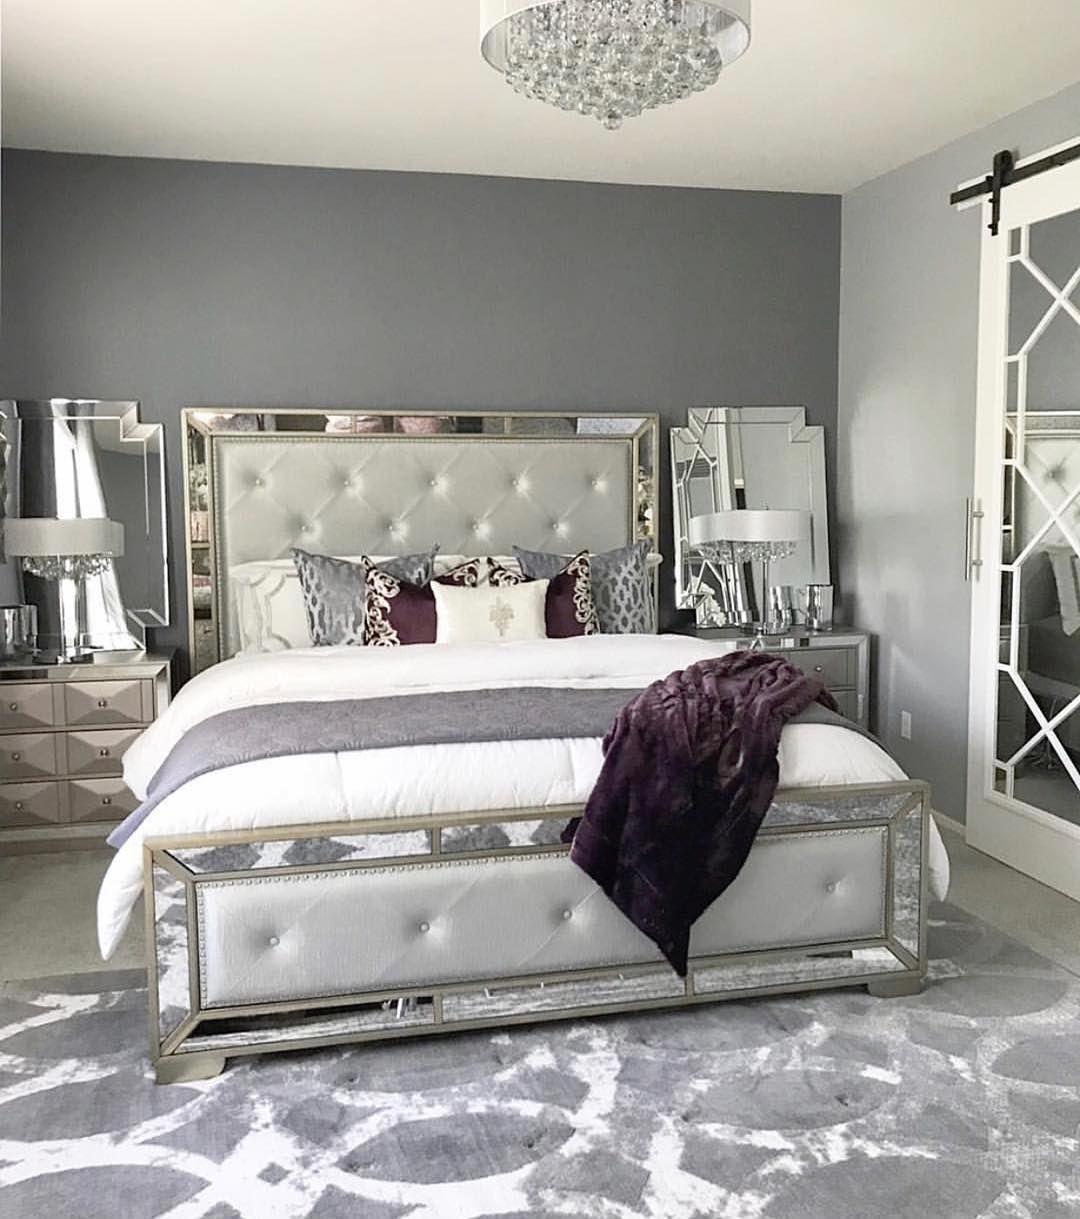 Beautiful Master Bedroom Decorating Ideas 62: อยากหลับฝันหวาน นอนสบายฝันดีทุกวี่วัน ฝันถูกรางวัลบ่อยๆ มา